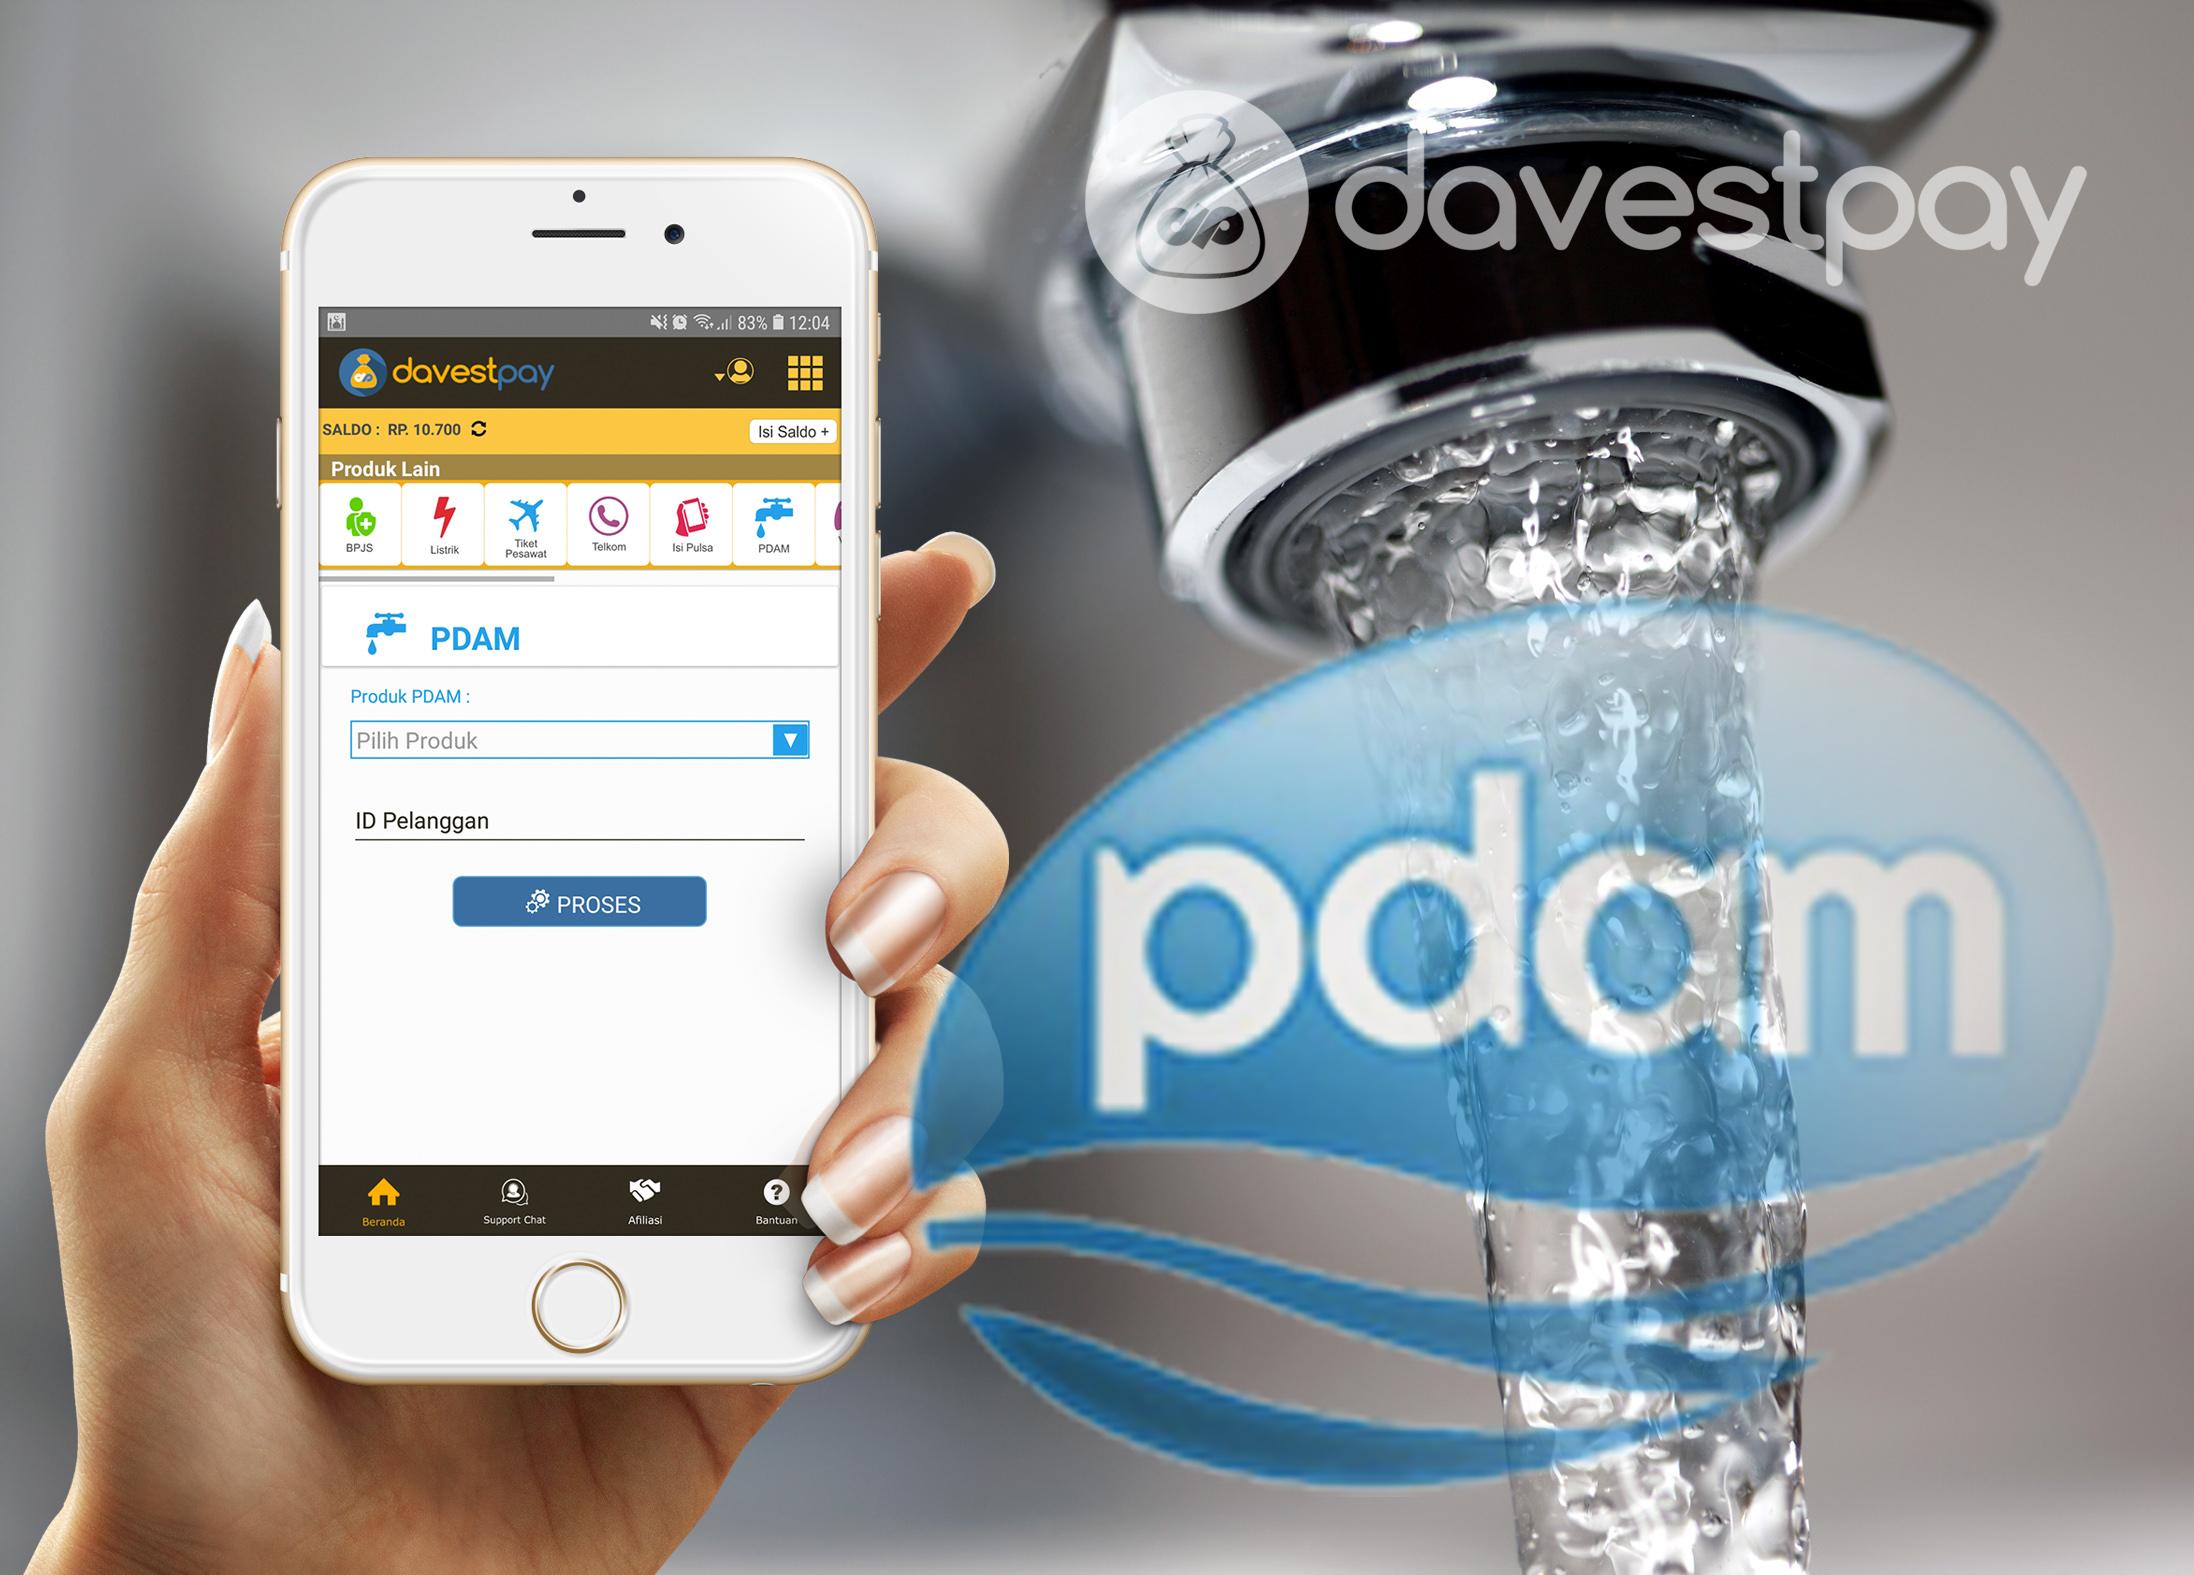 Kerjasama Dengan PDAM, DavestPay Bisa Bayar Tagihan Air Paling Lengkap